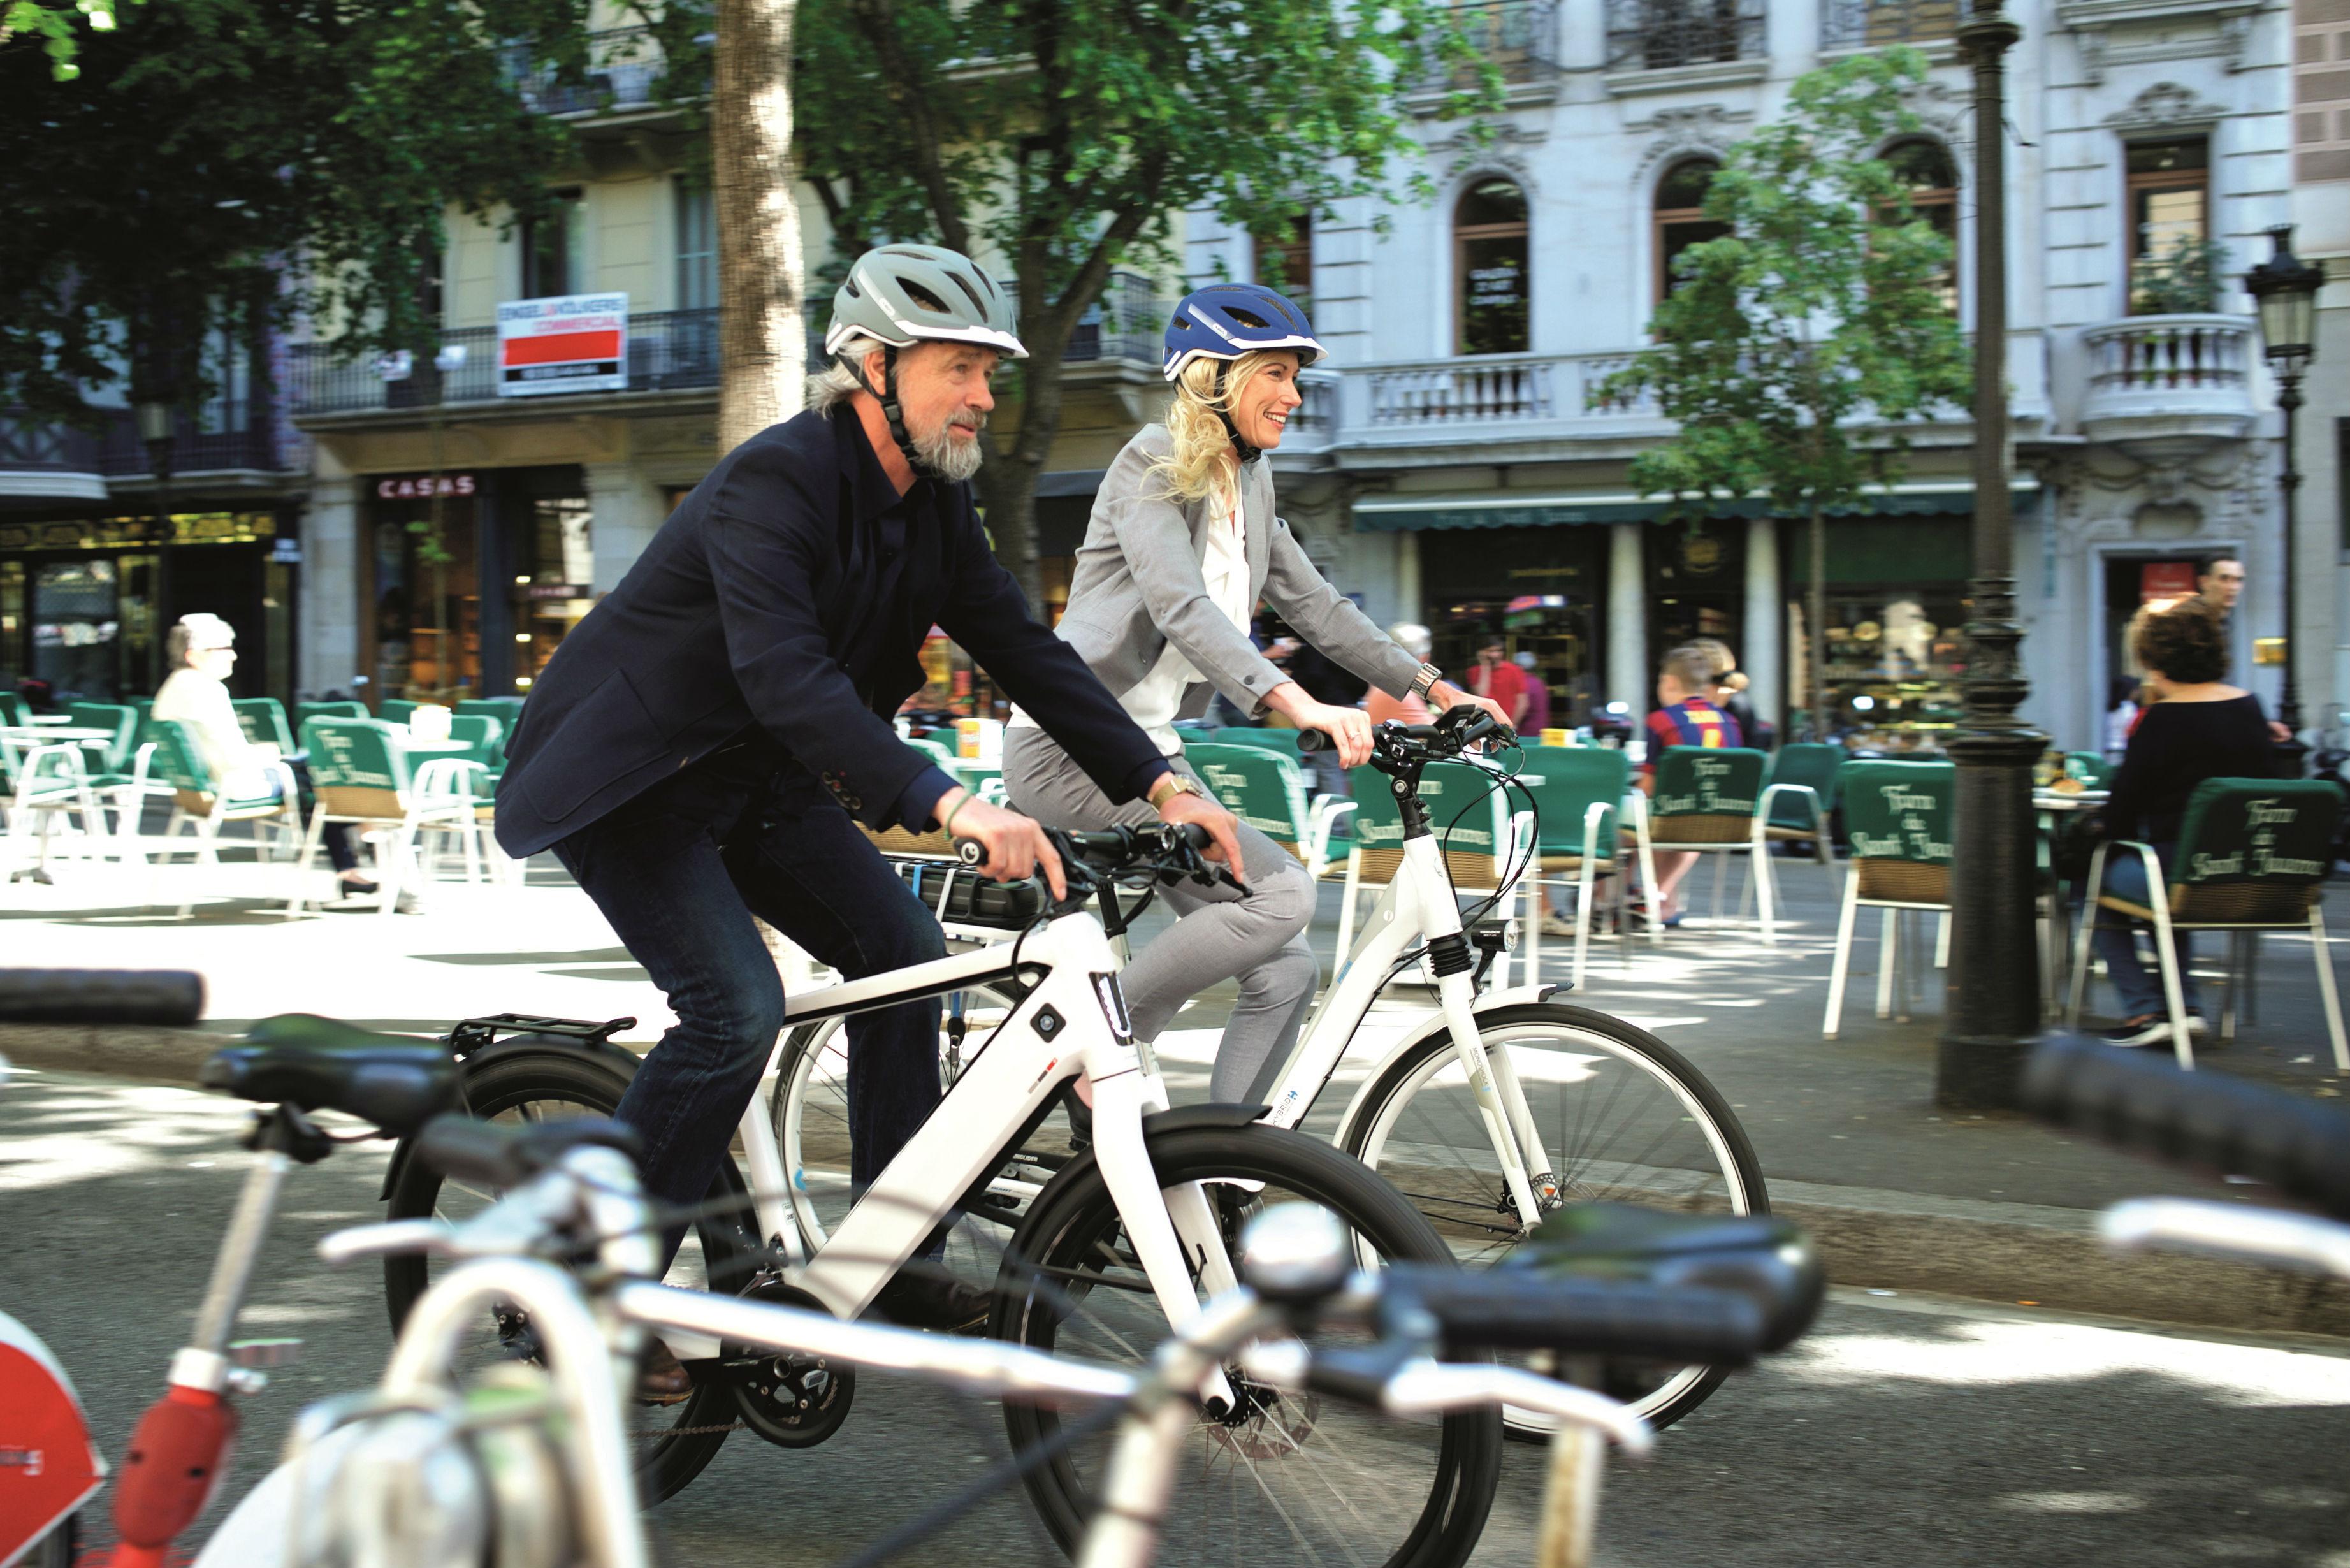 abus helm voor speed e bike begin 2017 leverbaar tweewieler. Black Bedroom Furniture Sets. Home Design Ideas